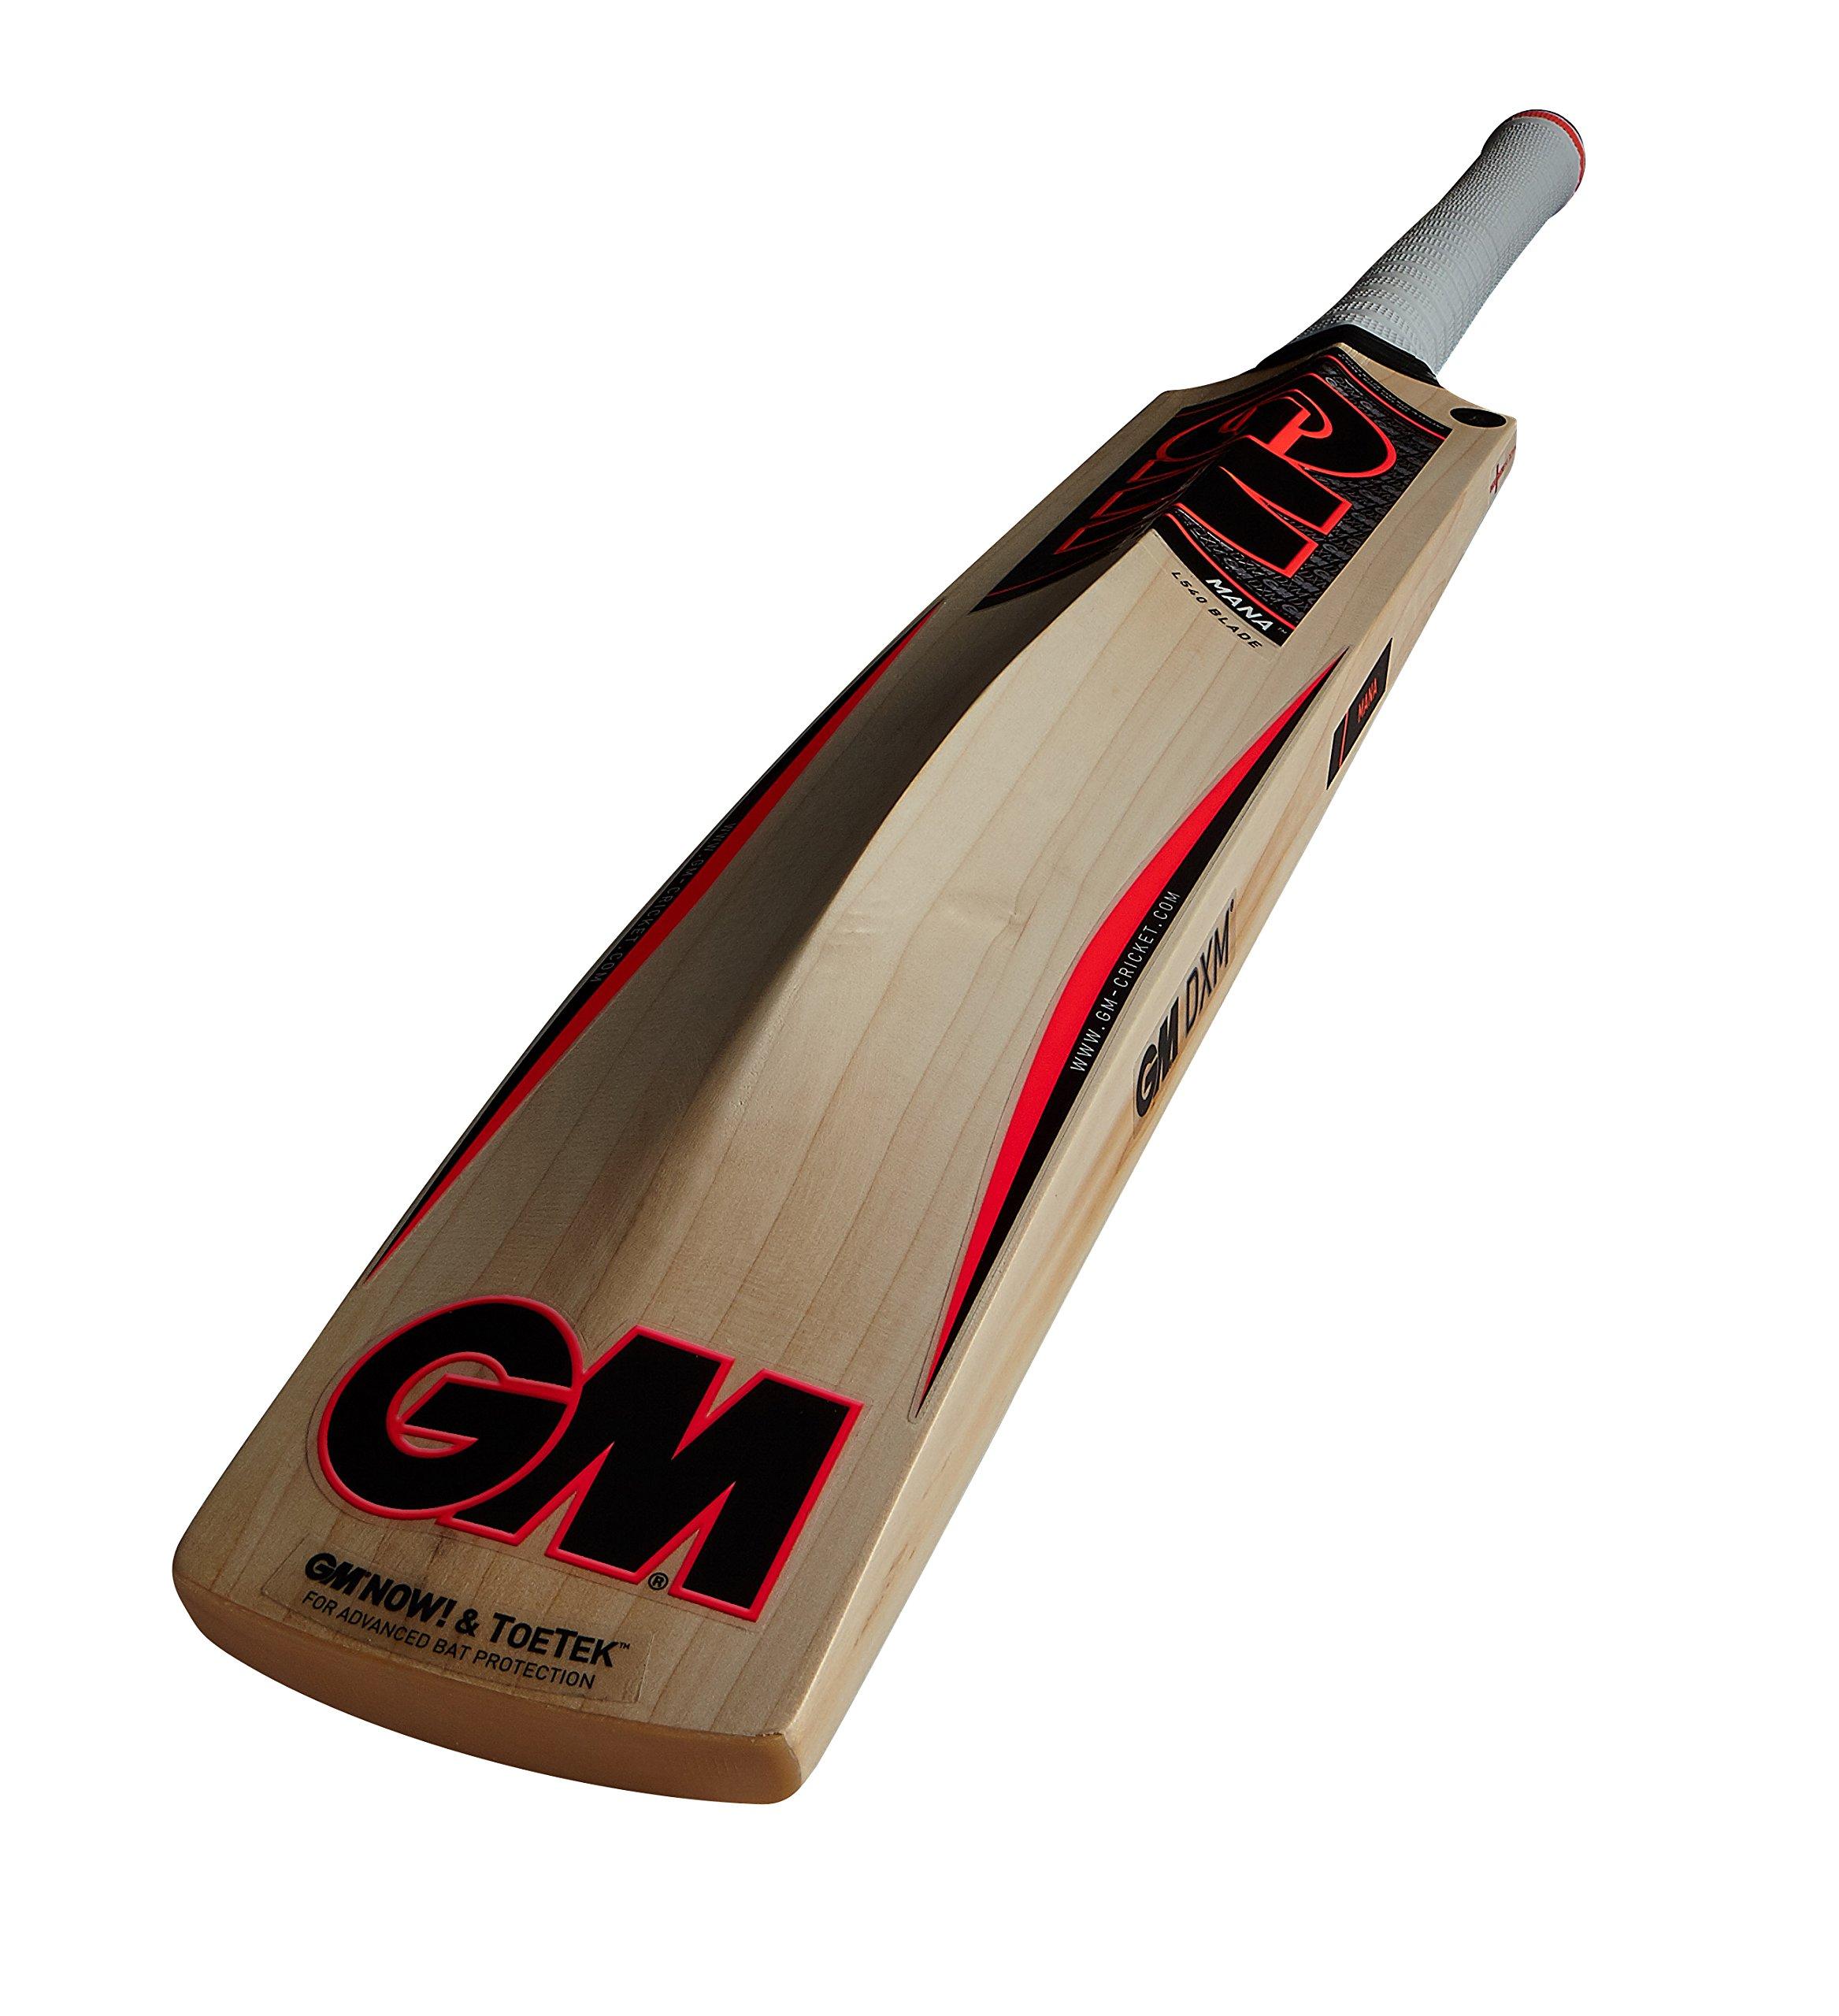 Gunn & Moore GM Mand DXM 606 Cricket Bat, Short Handle